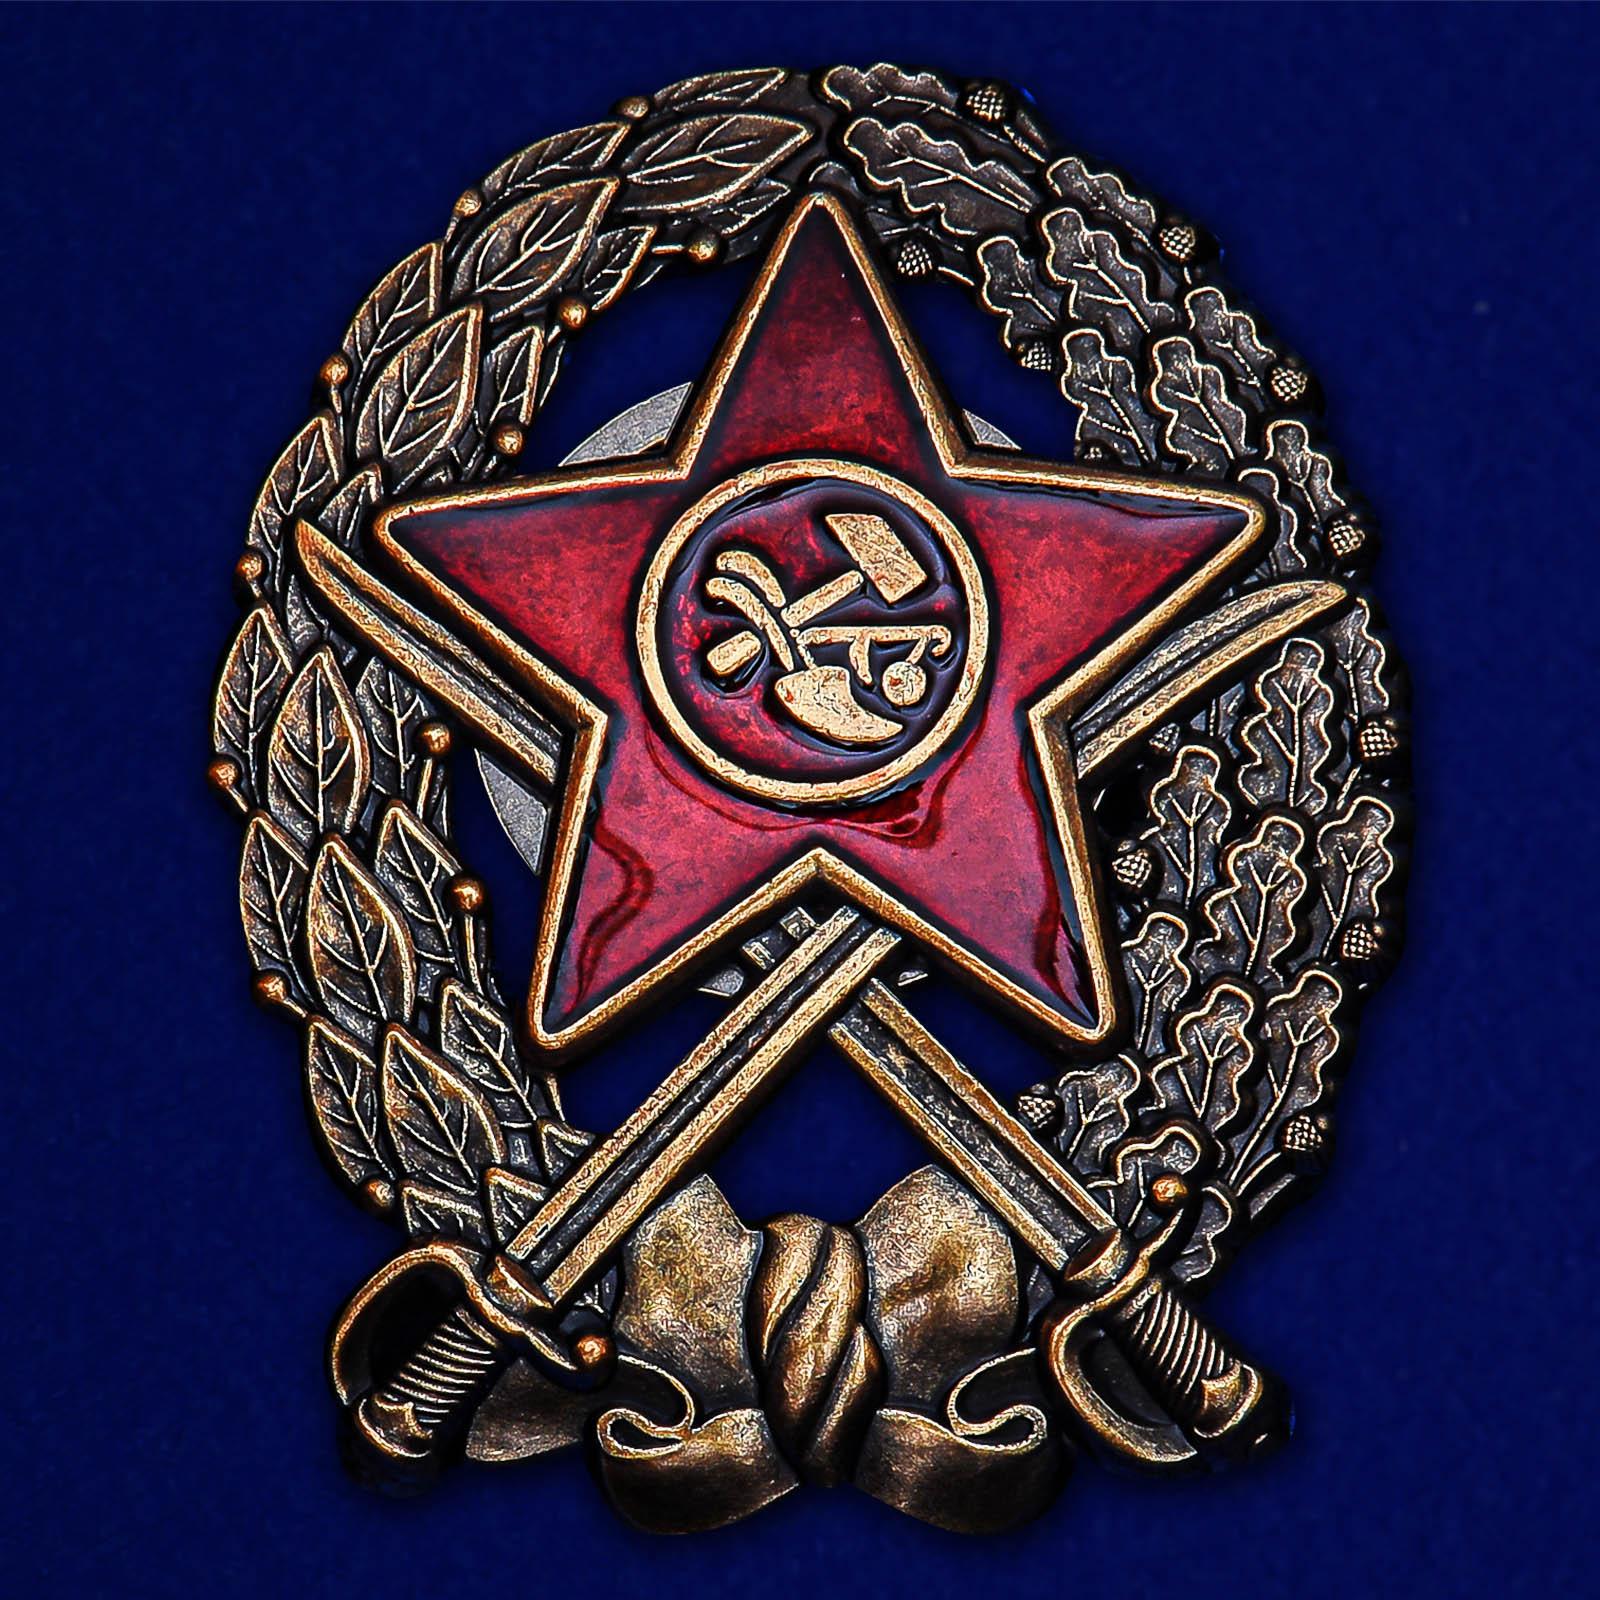 Знак Красного Командира кавалерийских частей РККА